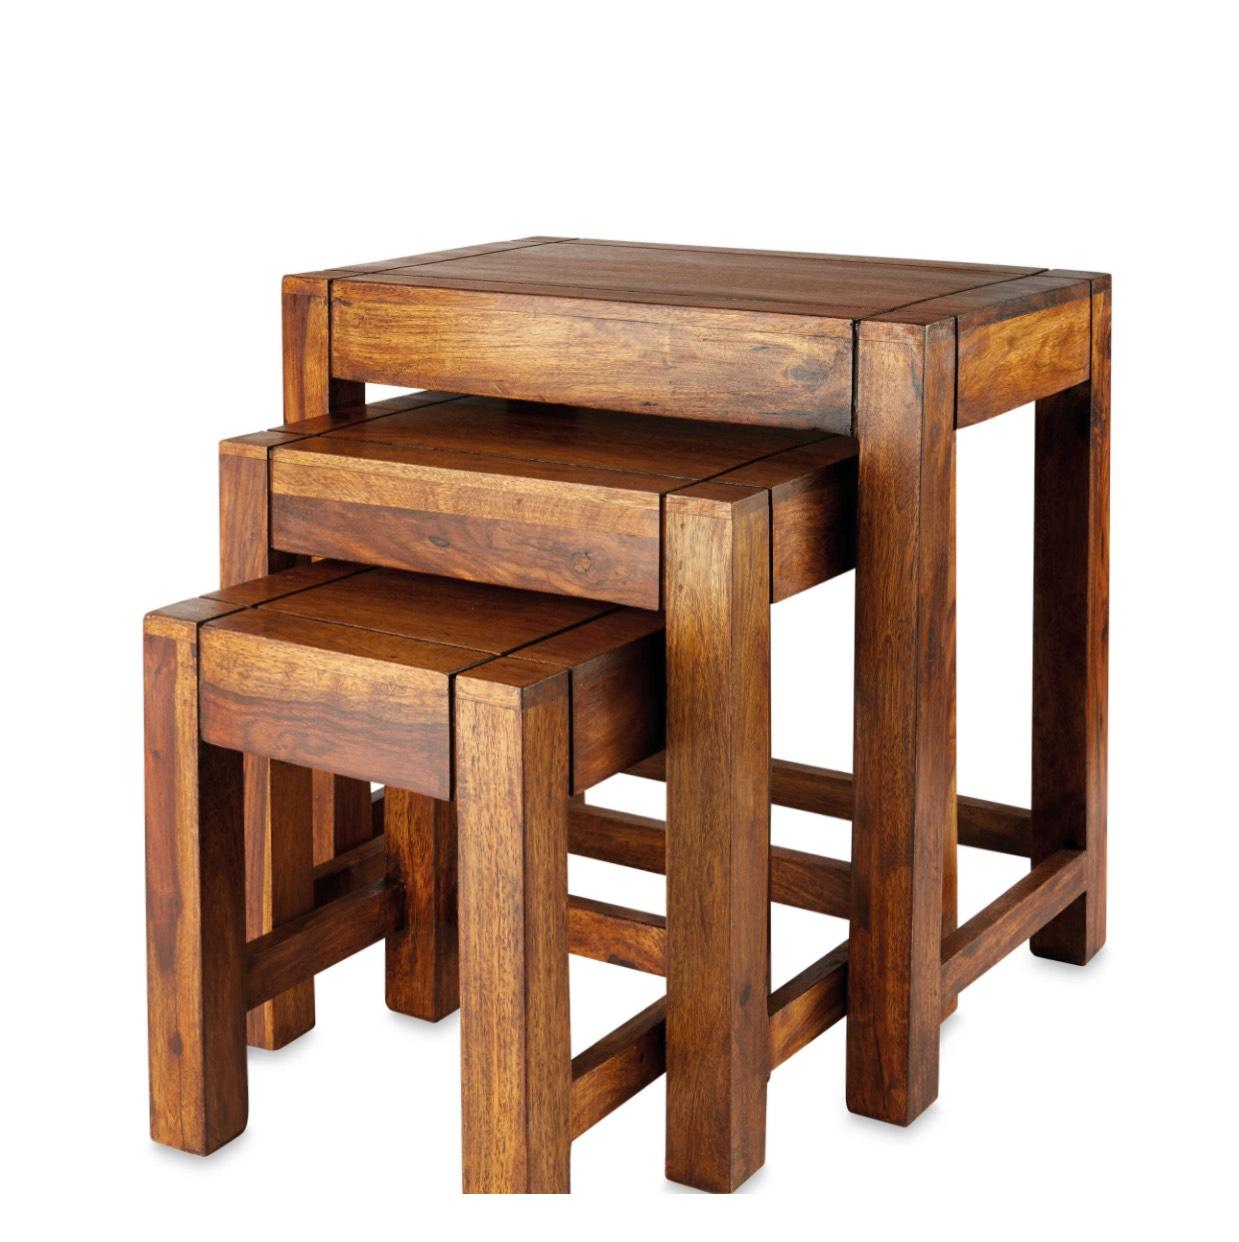 Sheesham Wood Nesting Tables £39.99 @ Aldi